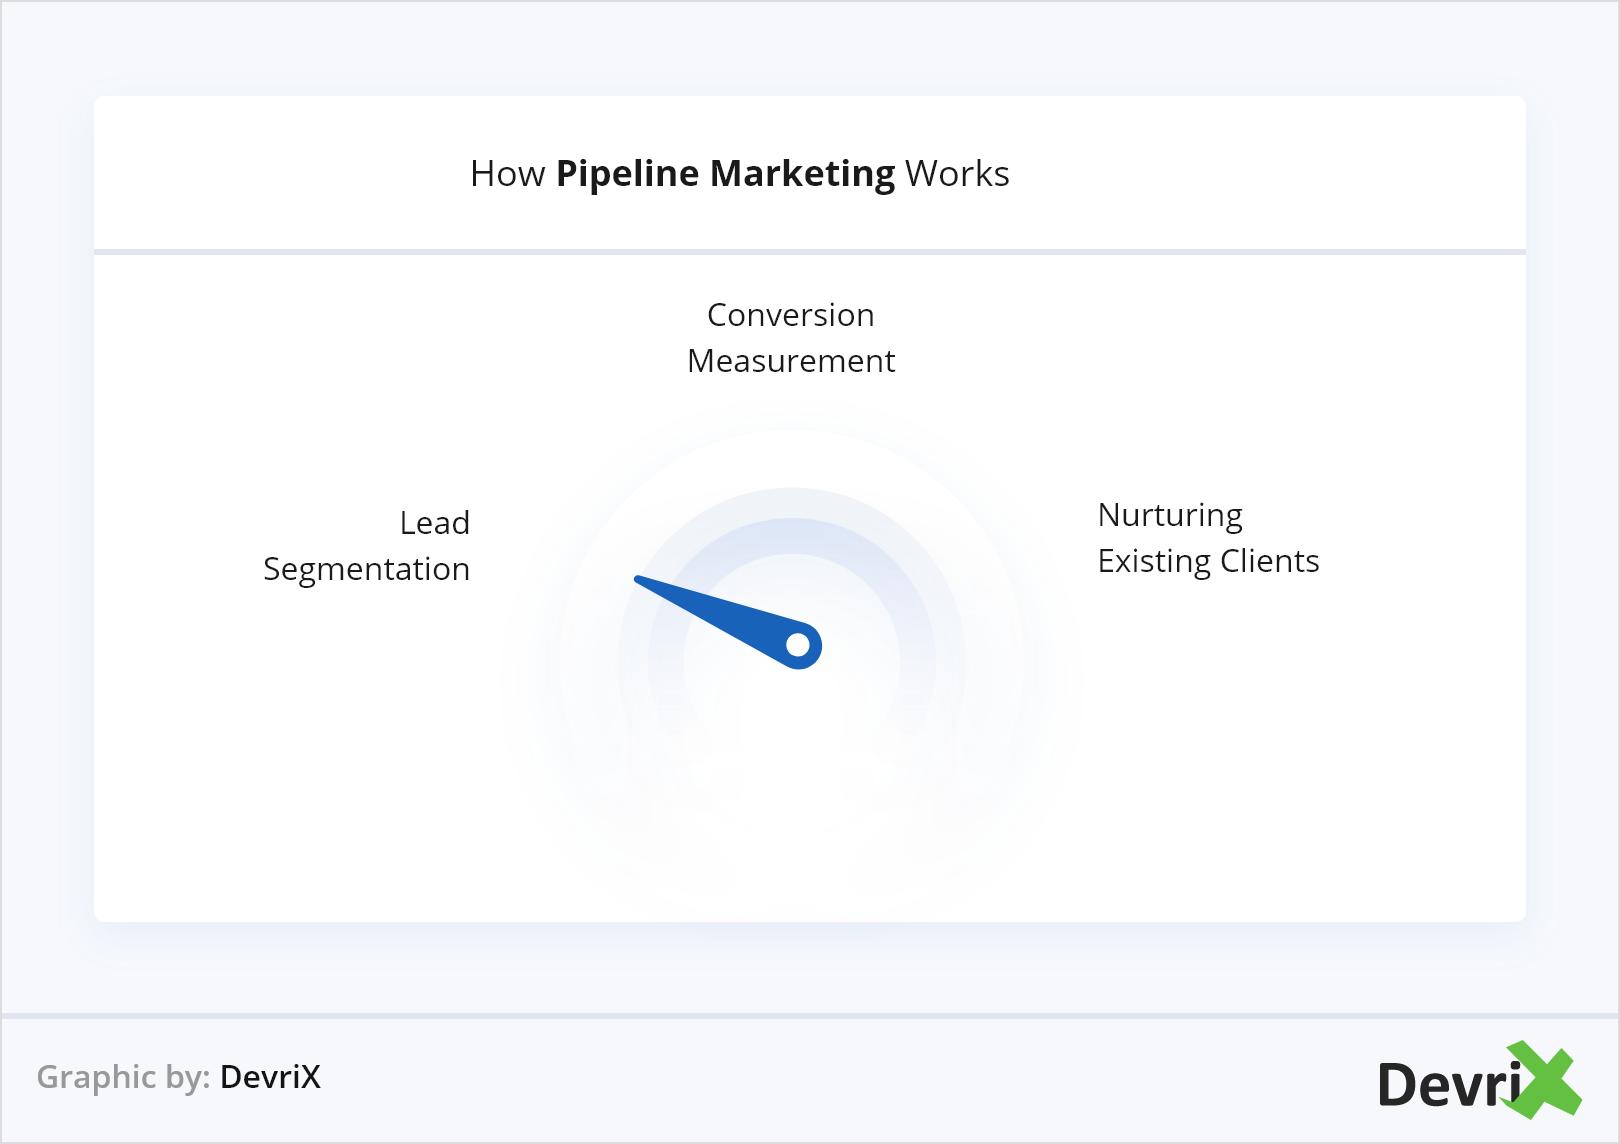 How Pipeline Marketing Works